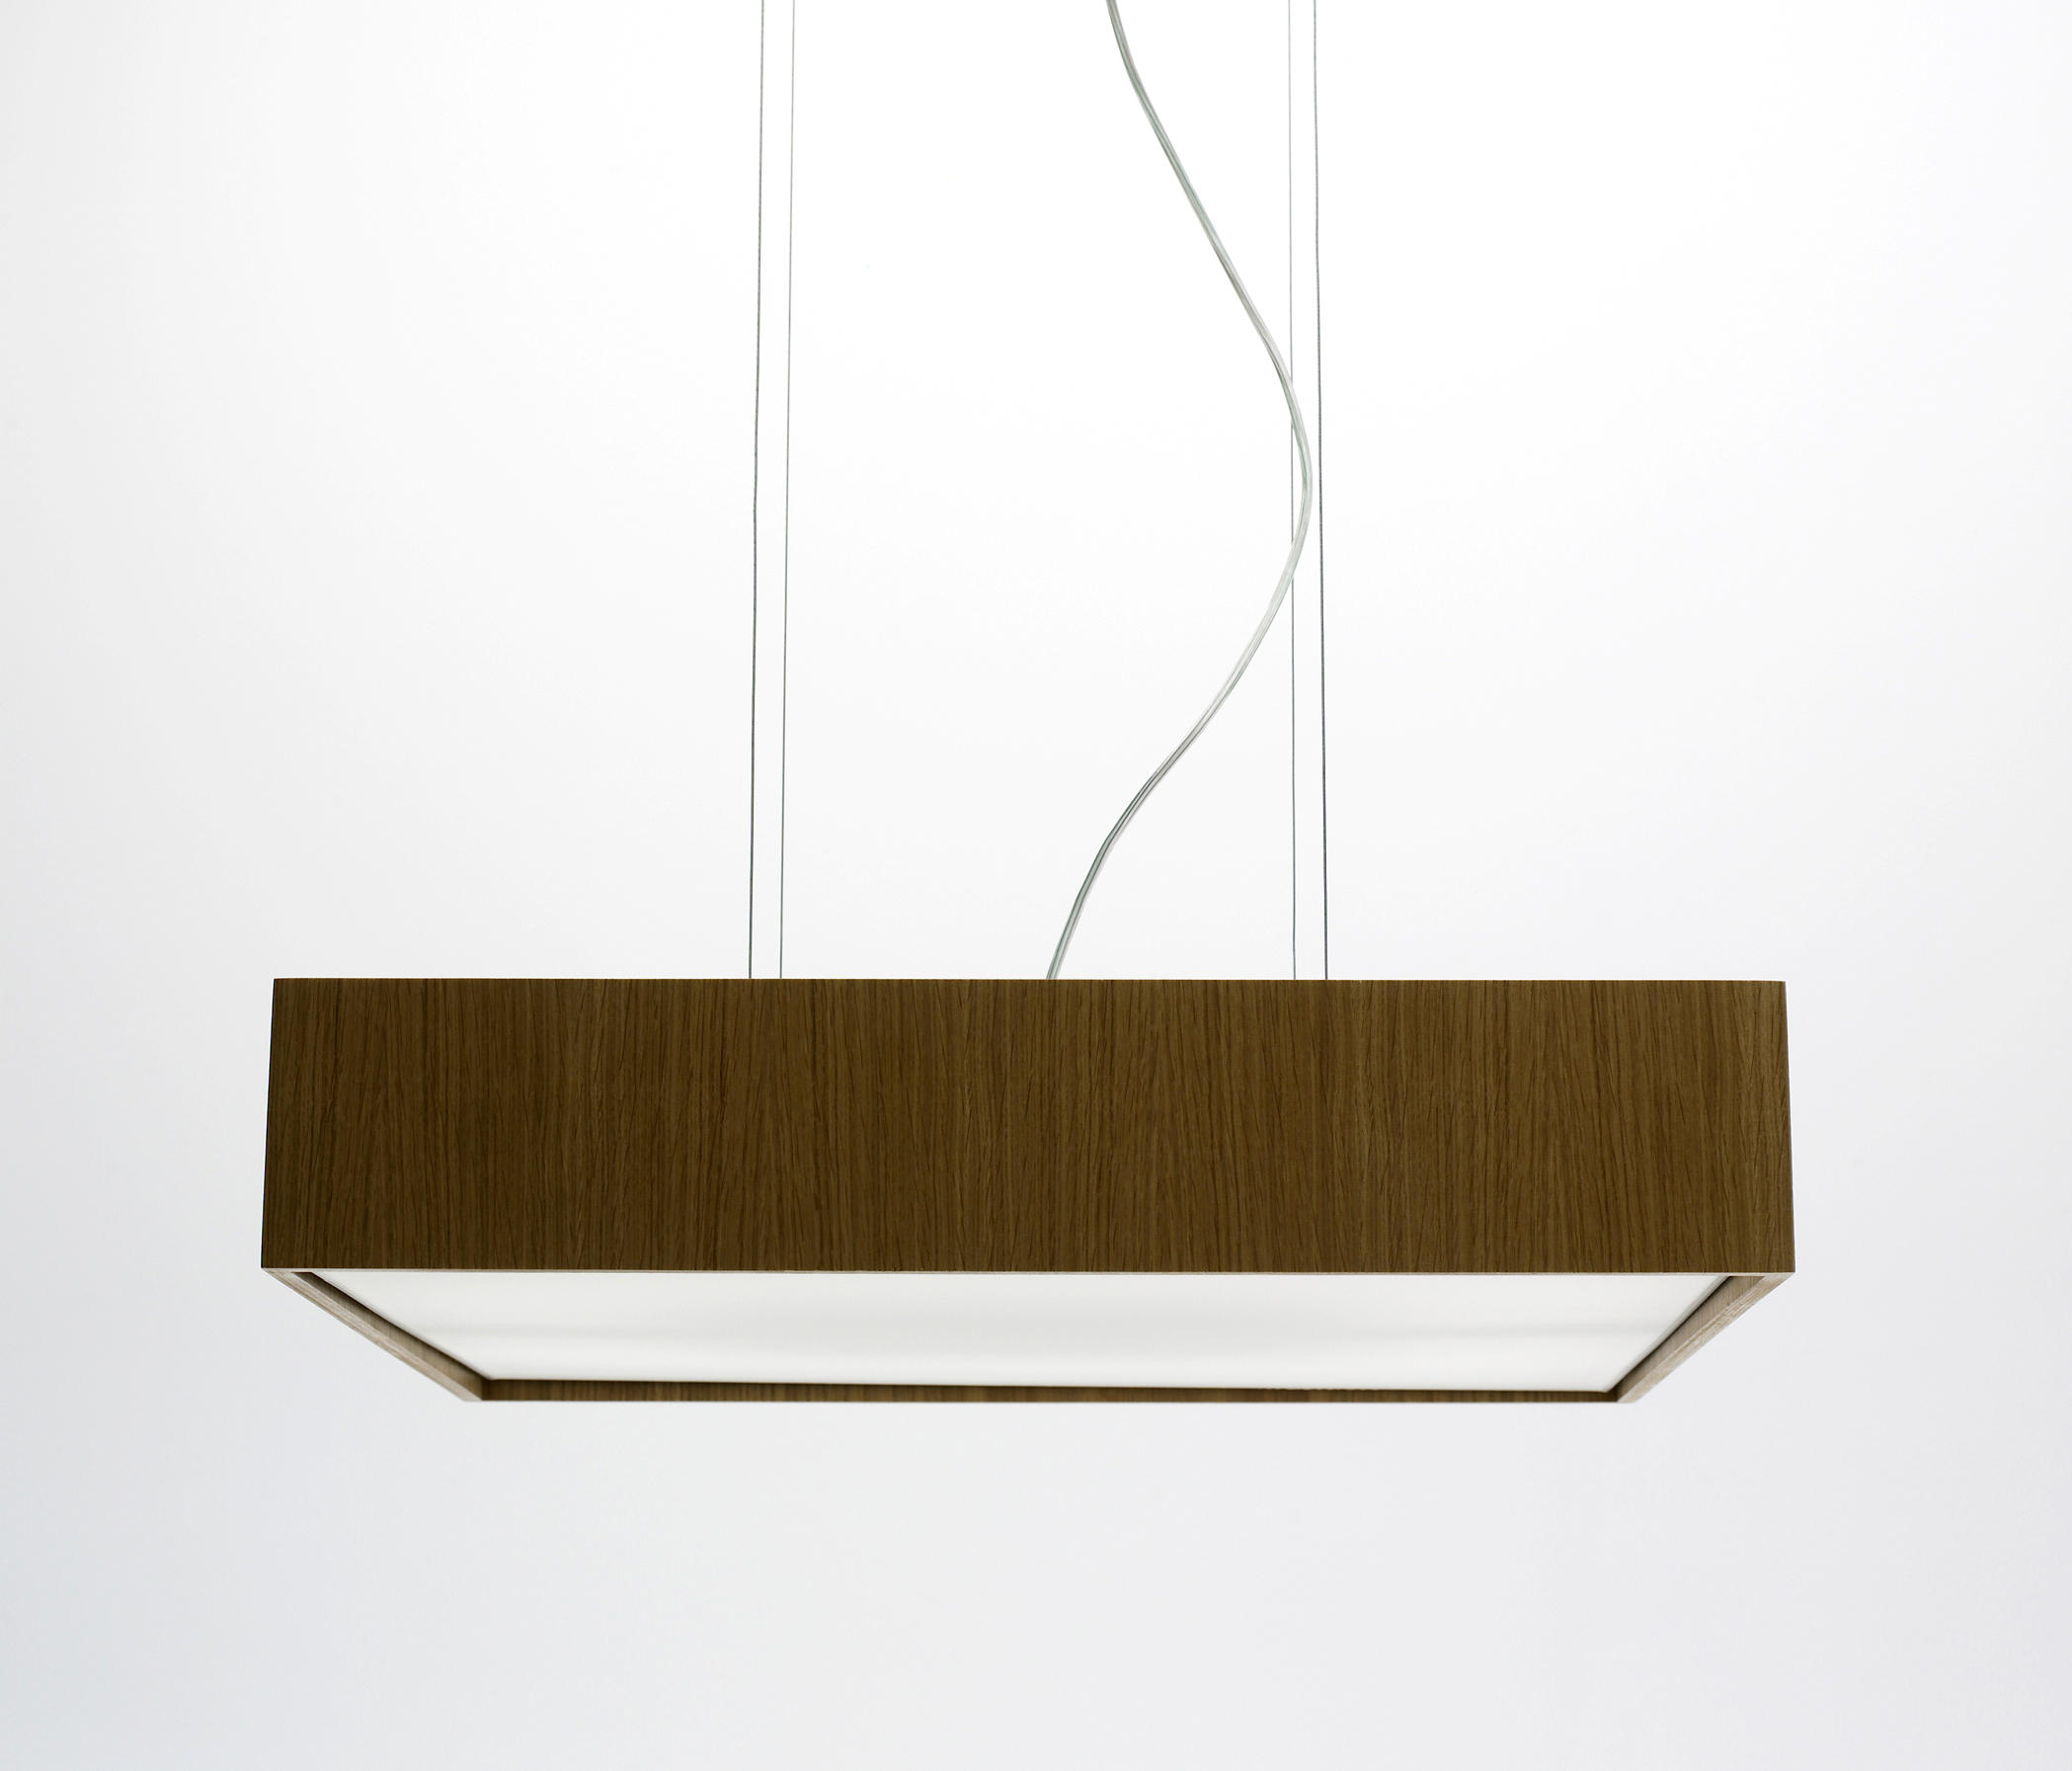 Quadrat S60x60 Lamp Pendant Lamp 4x24W (G5) - white